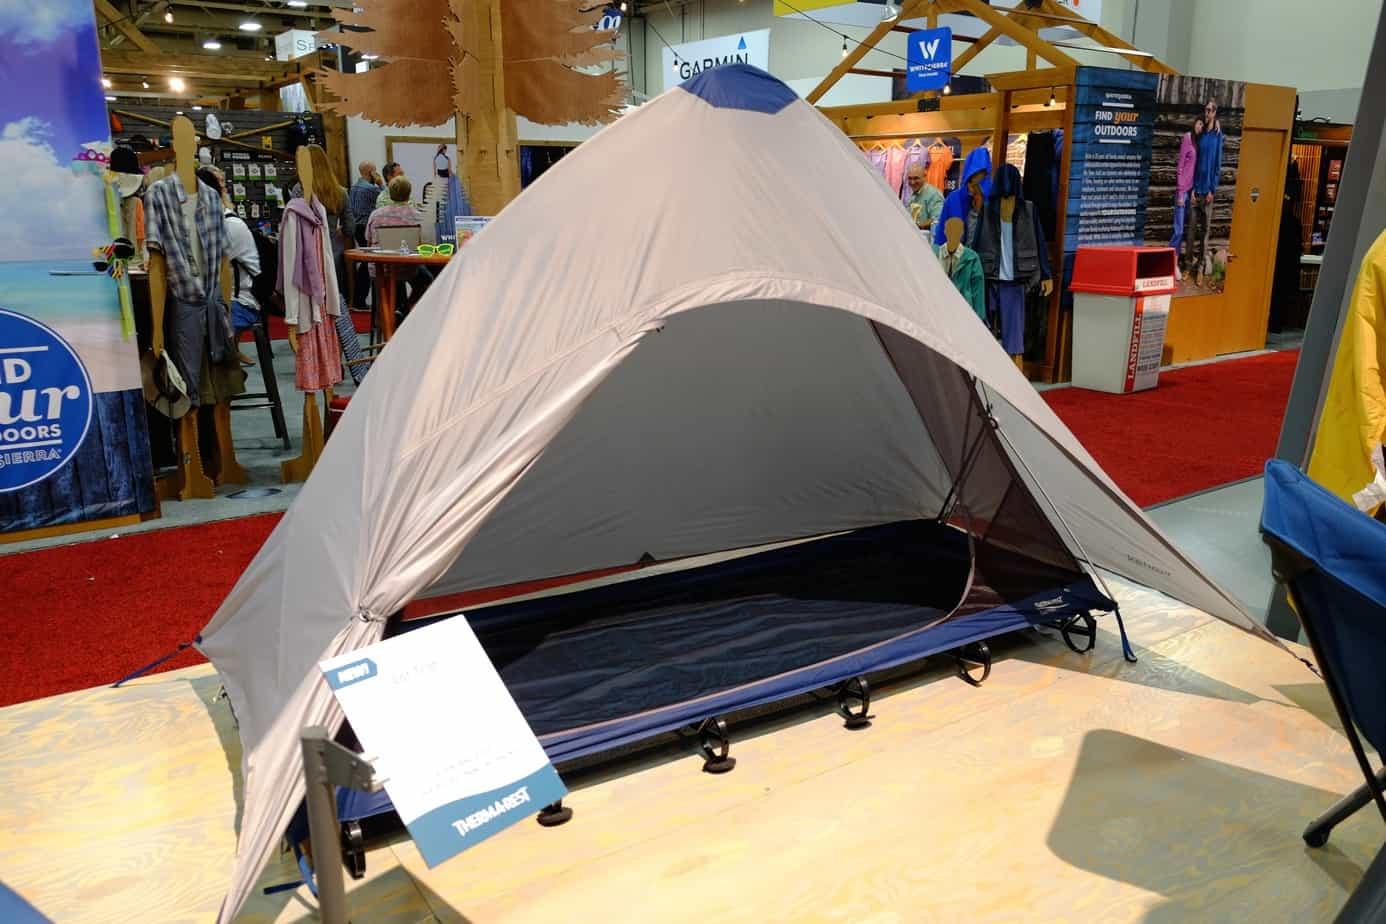 Outdoor Retailer 2015: New Toys for Overlanders